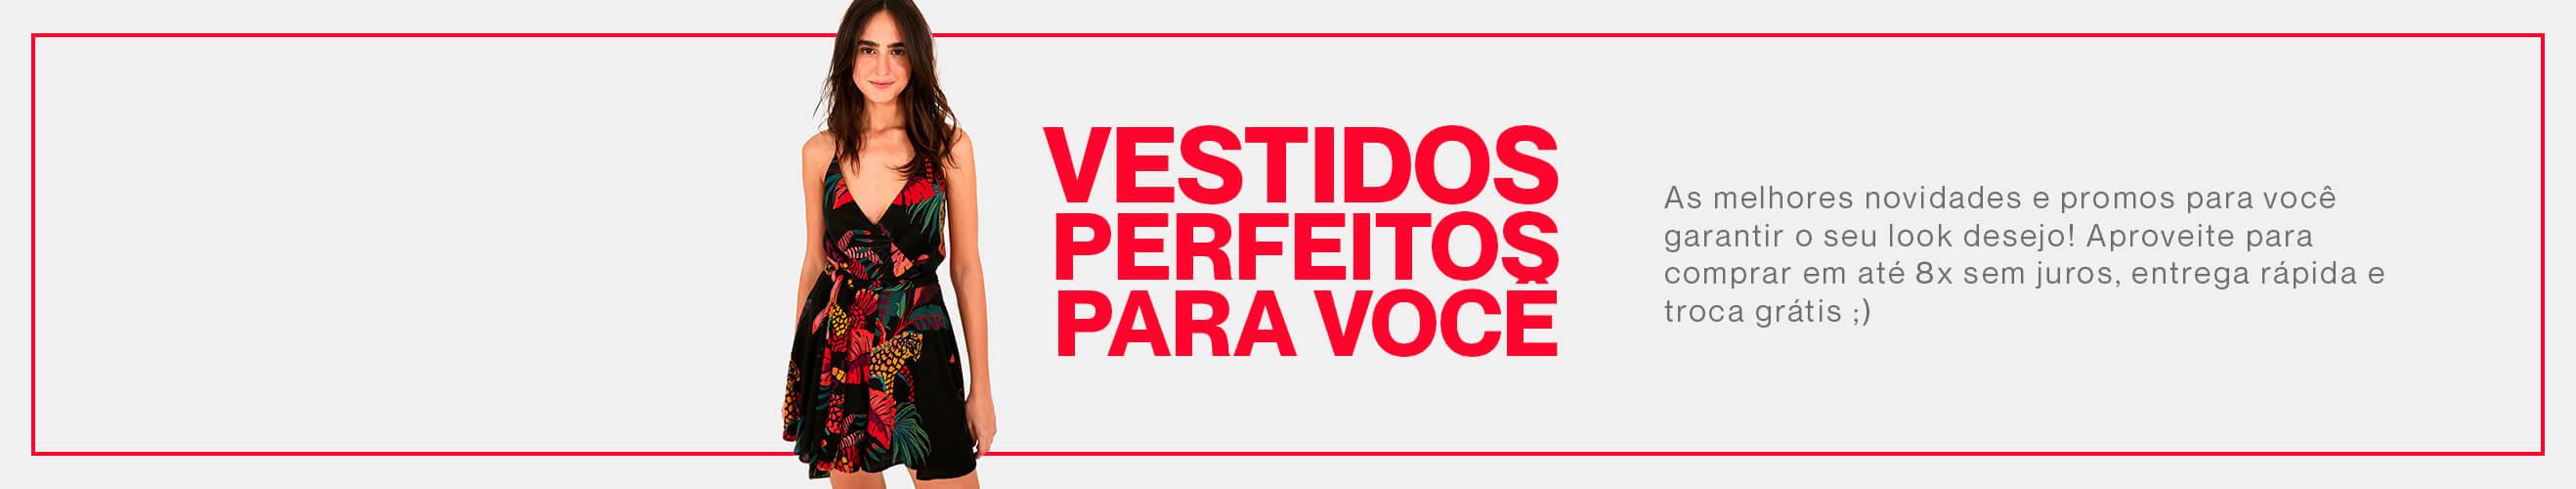 Banner Desktop - Vestidos